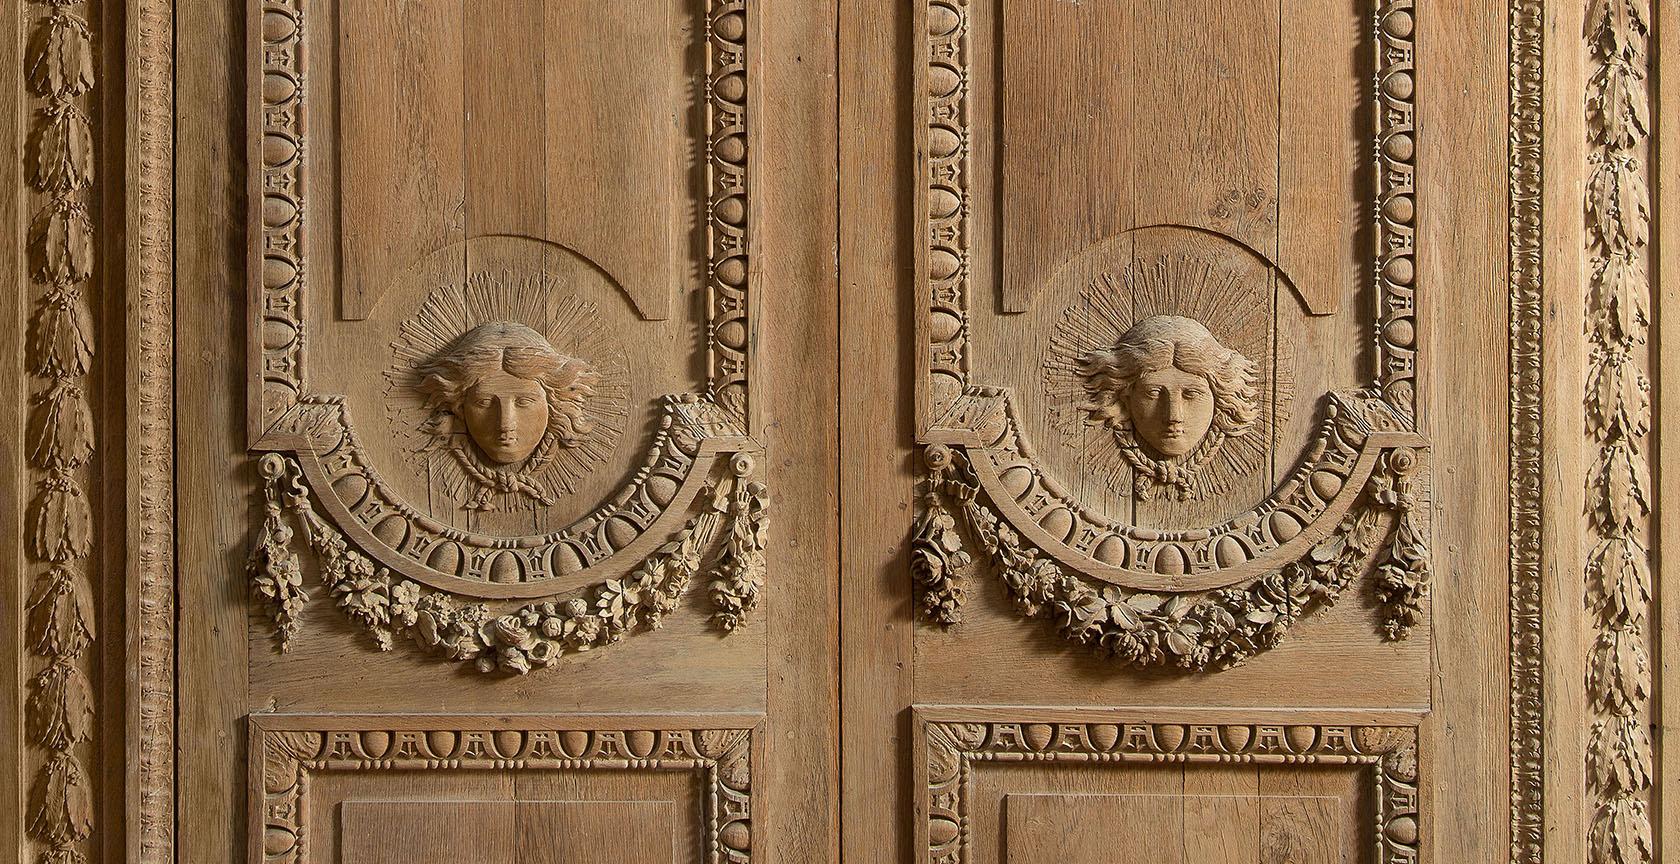 Double porte chêne sculpté XVIIe Apollon Rayonnant attribué Claude Nicolas Ledoux